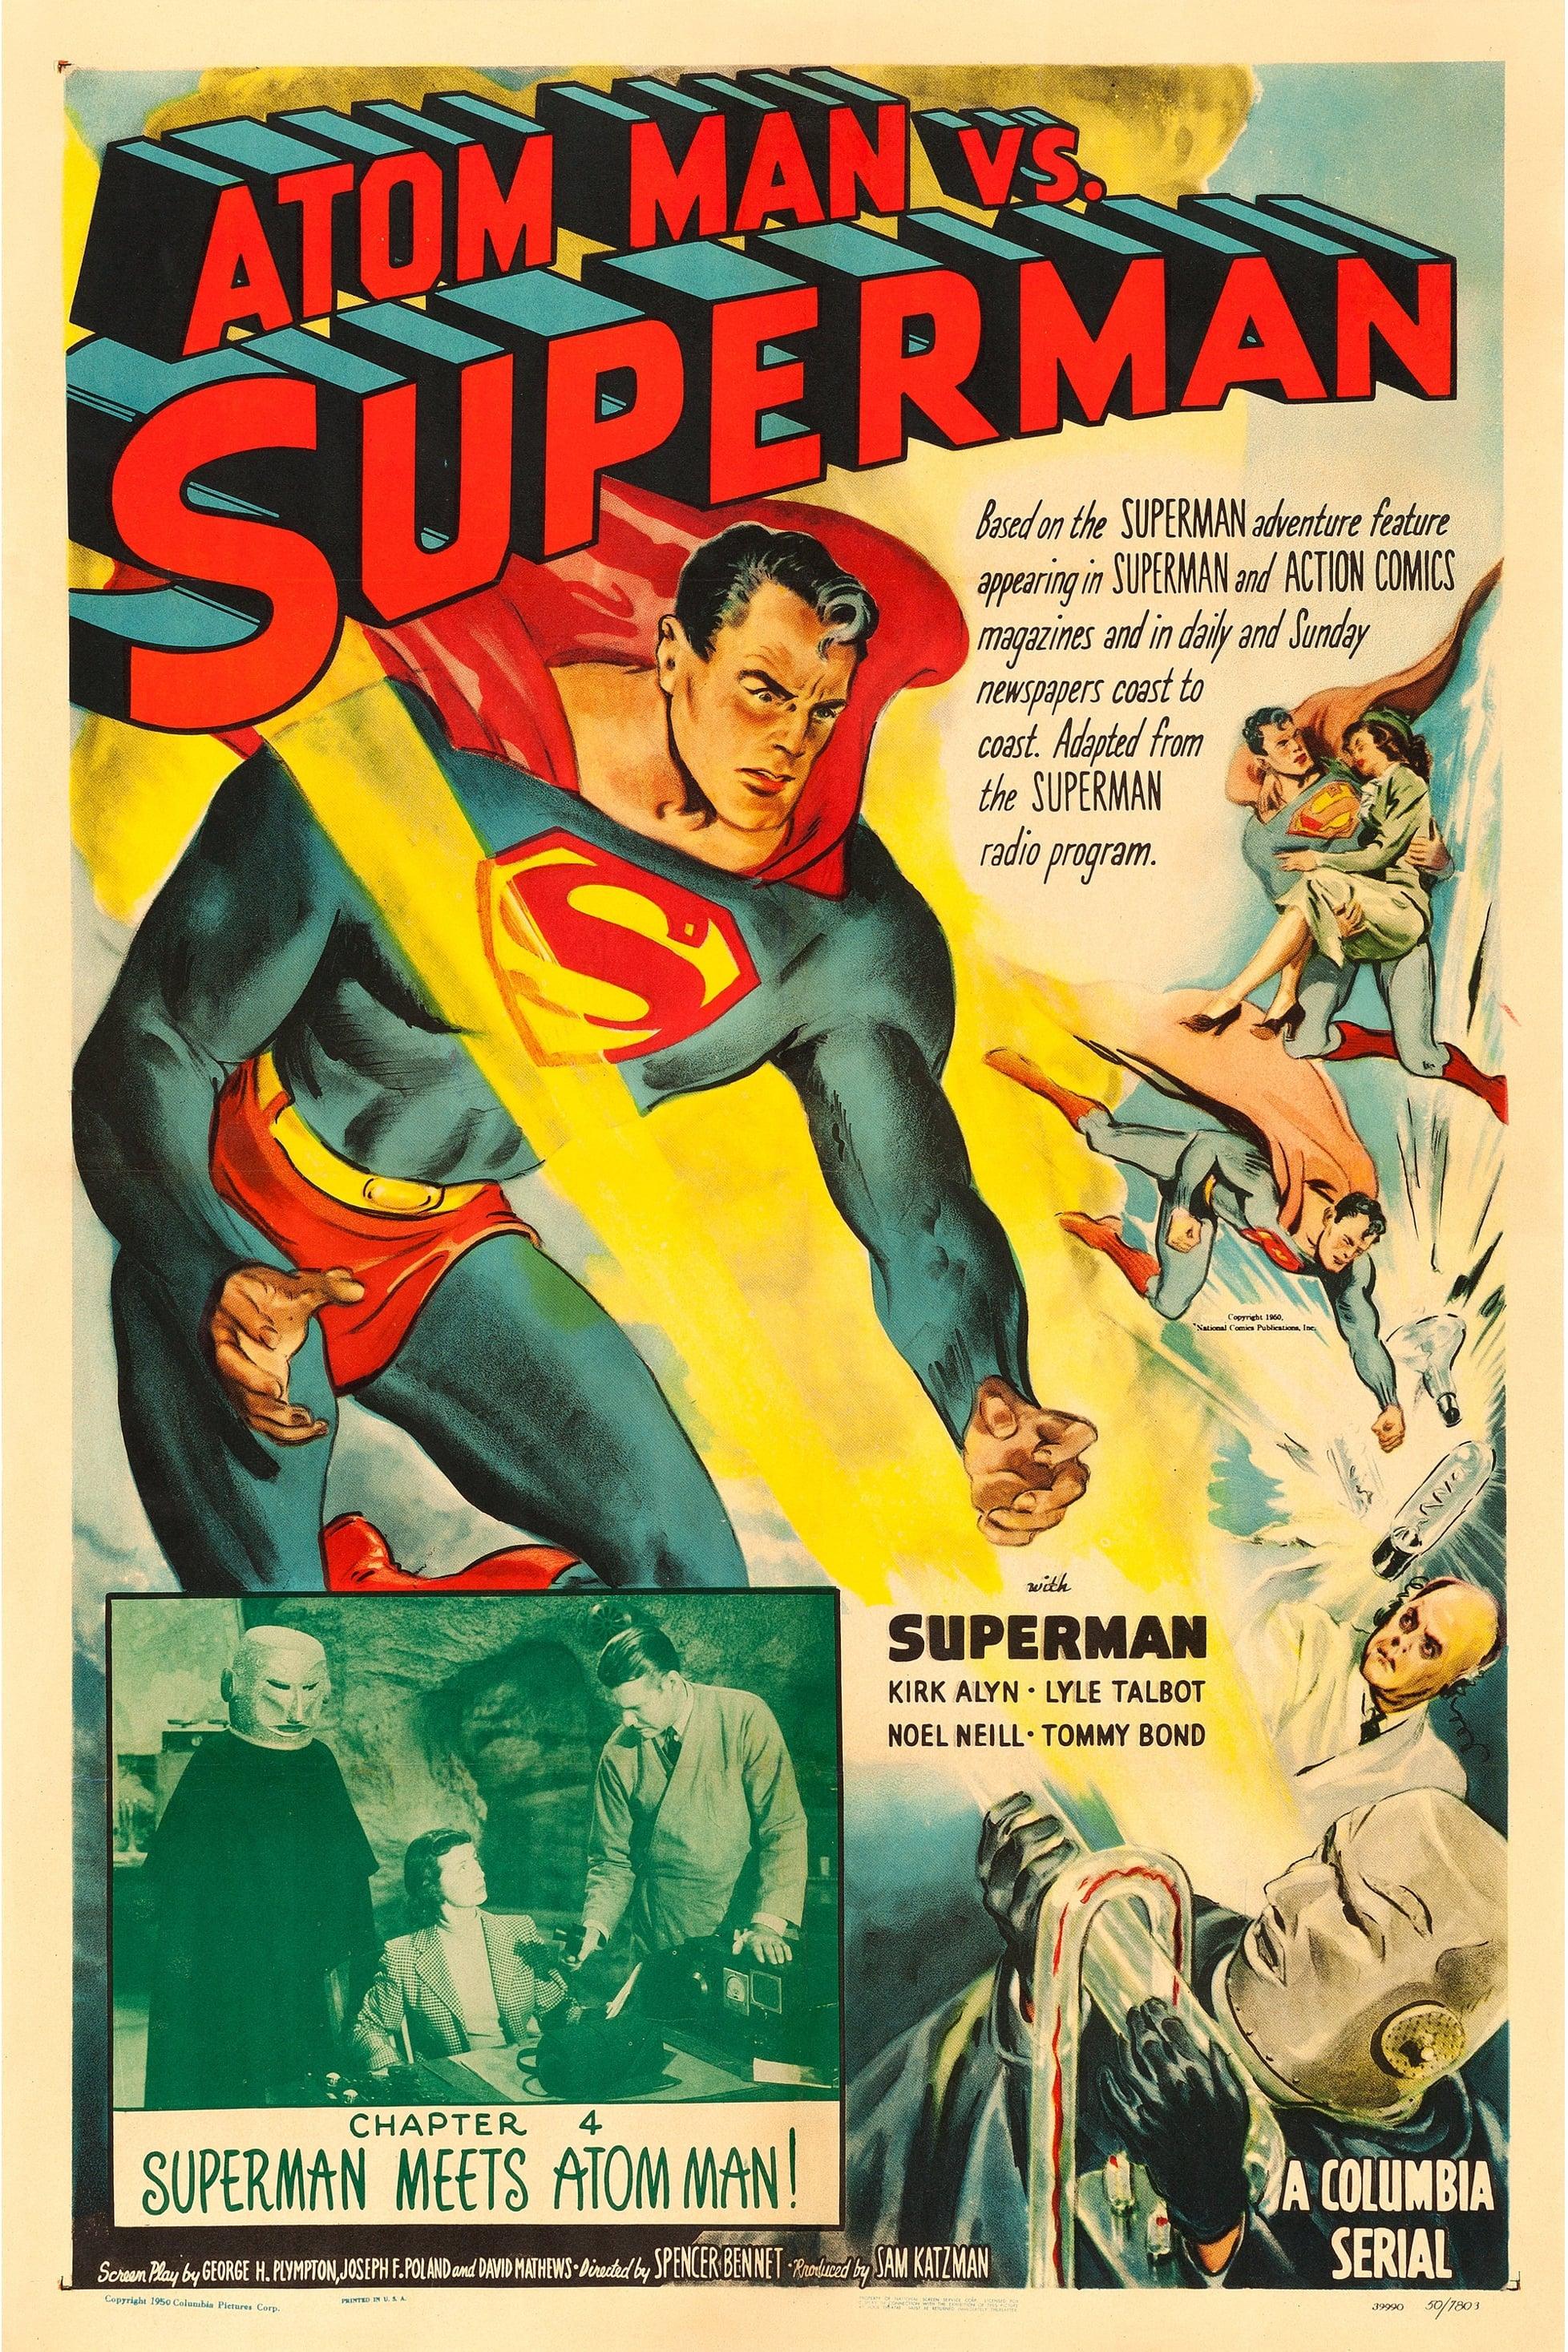 Atom Man vs Superman